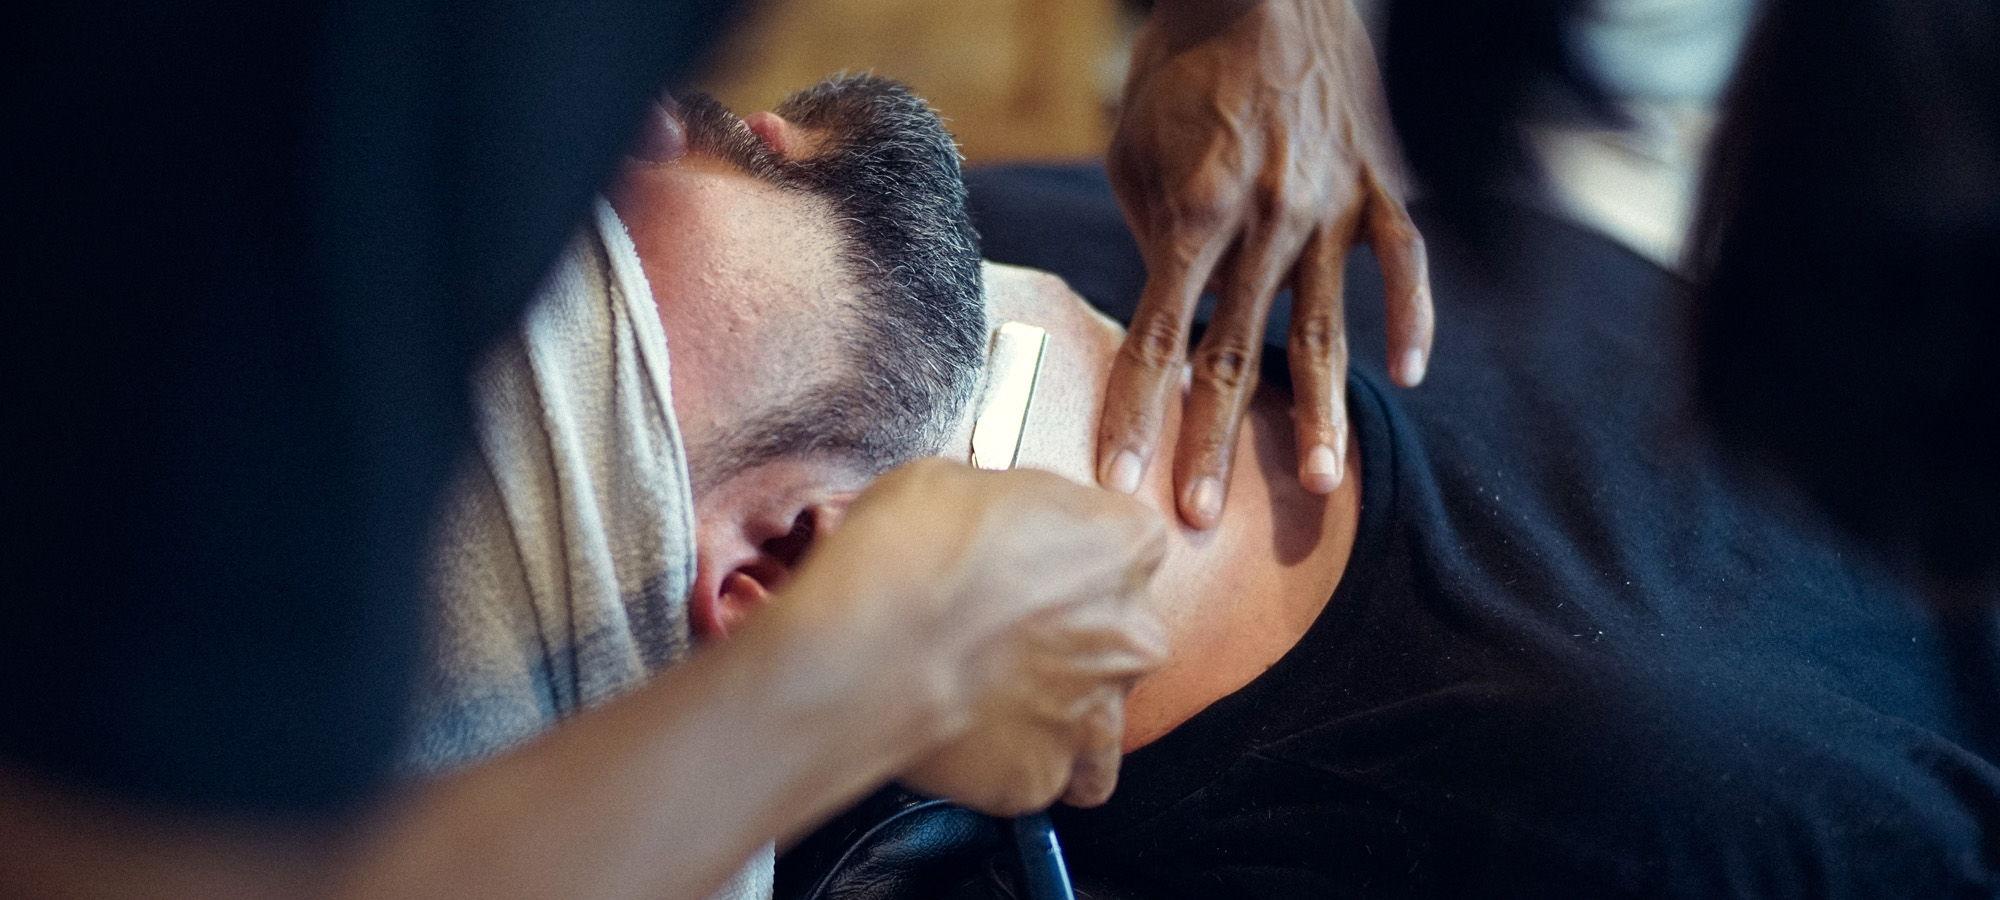 profesional barberia